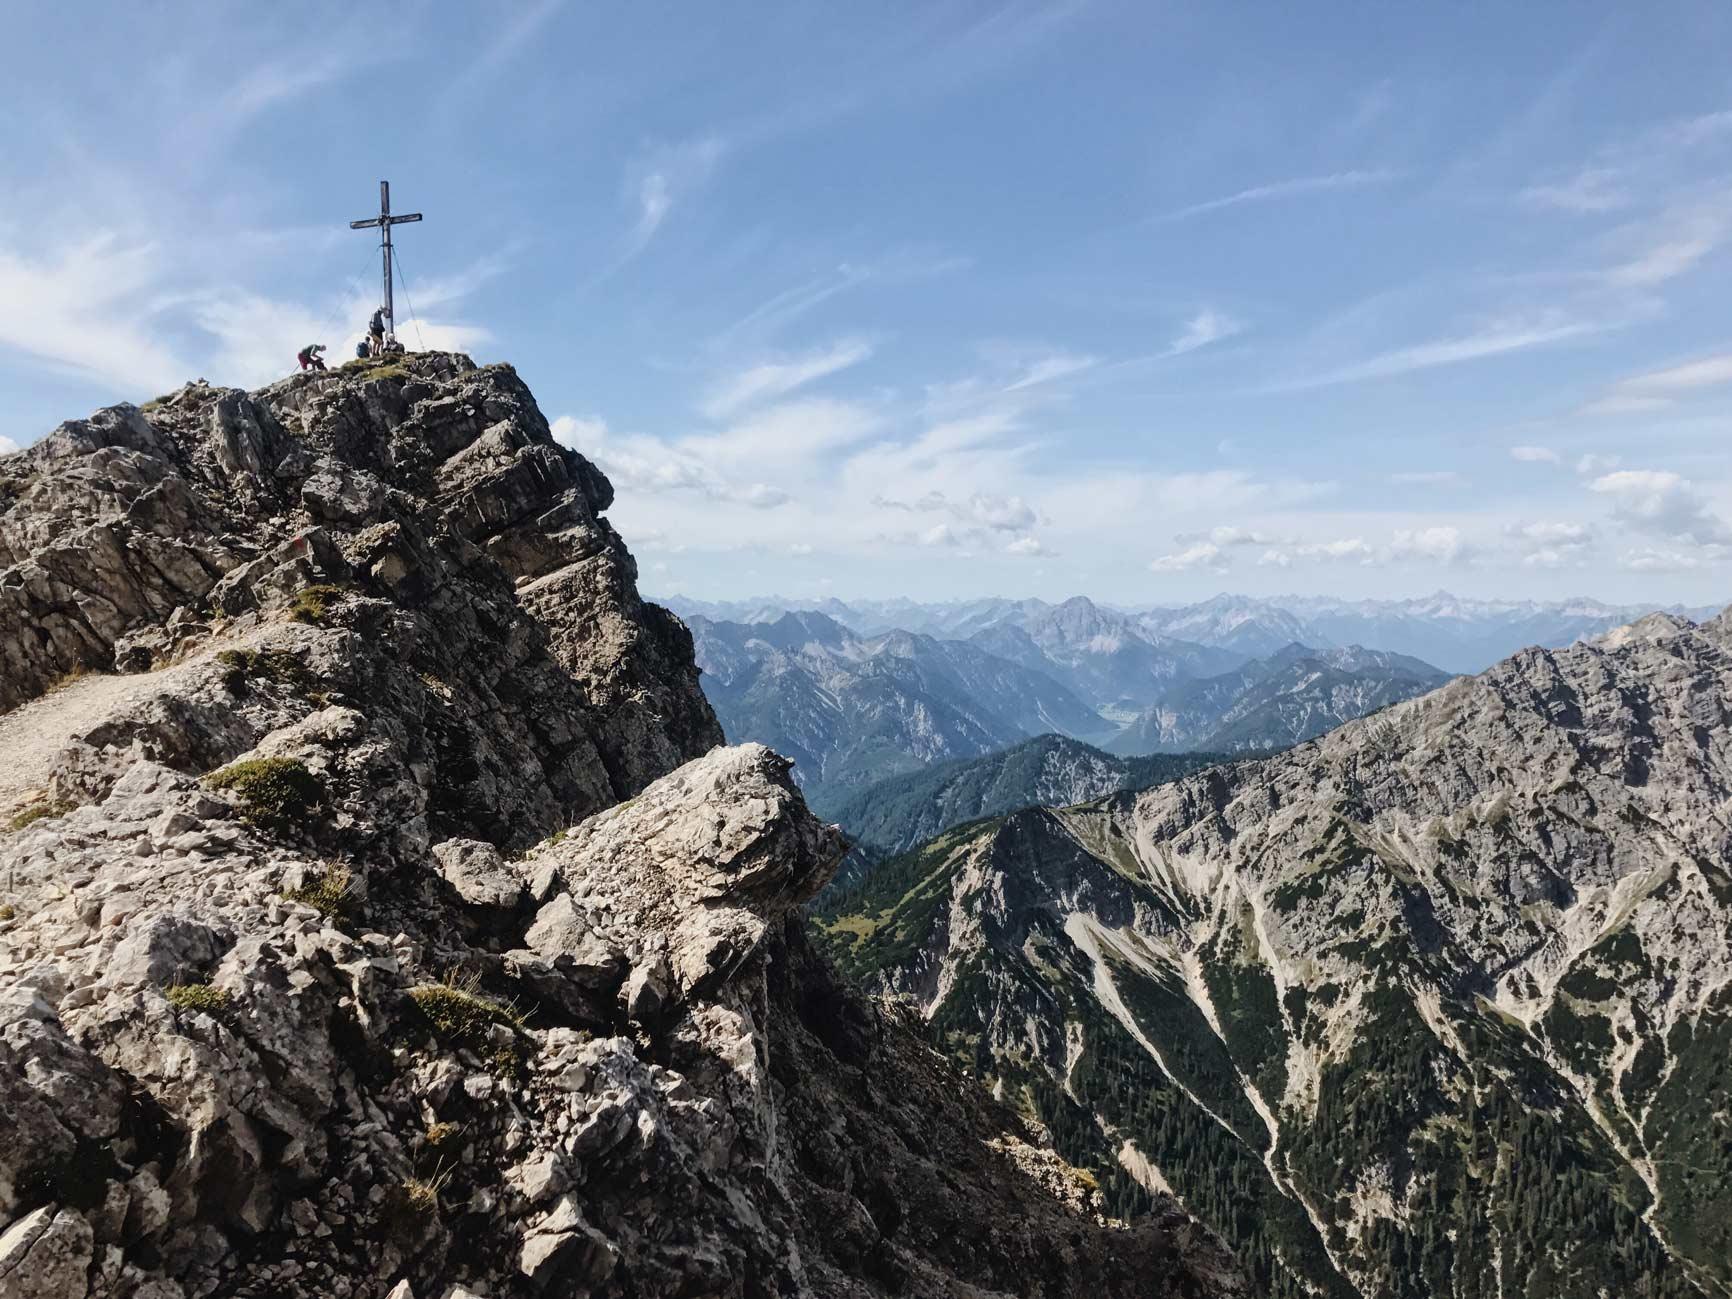 laura-schloemmer-kreuzspitze-bergsteigen-wandern-munichmountaingirls-frauen-bergblog